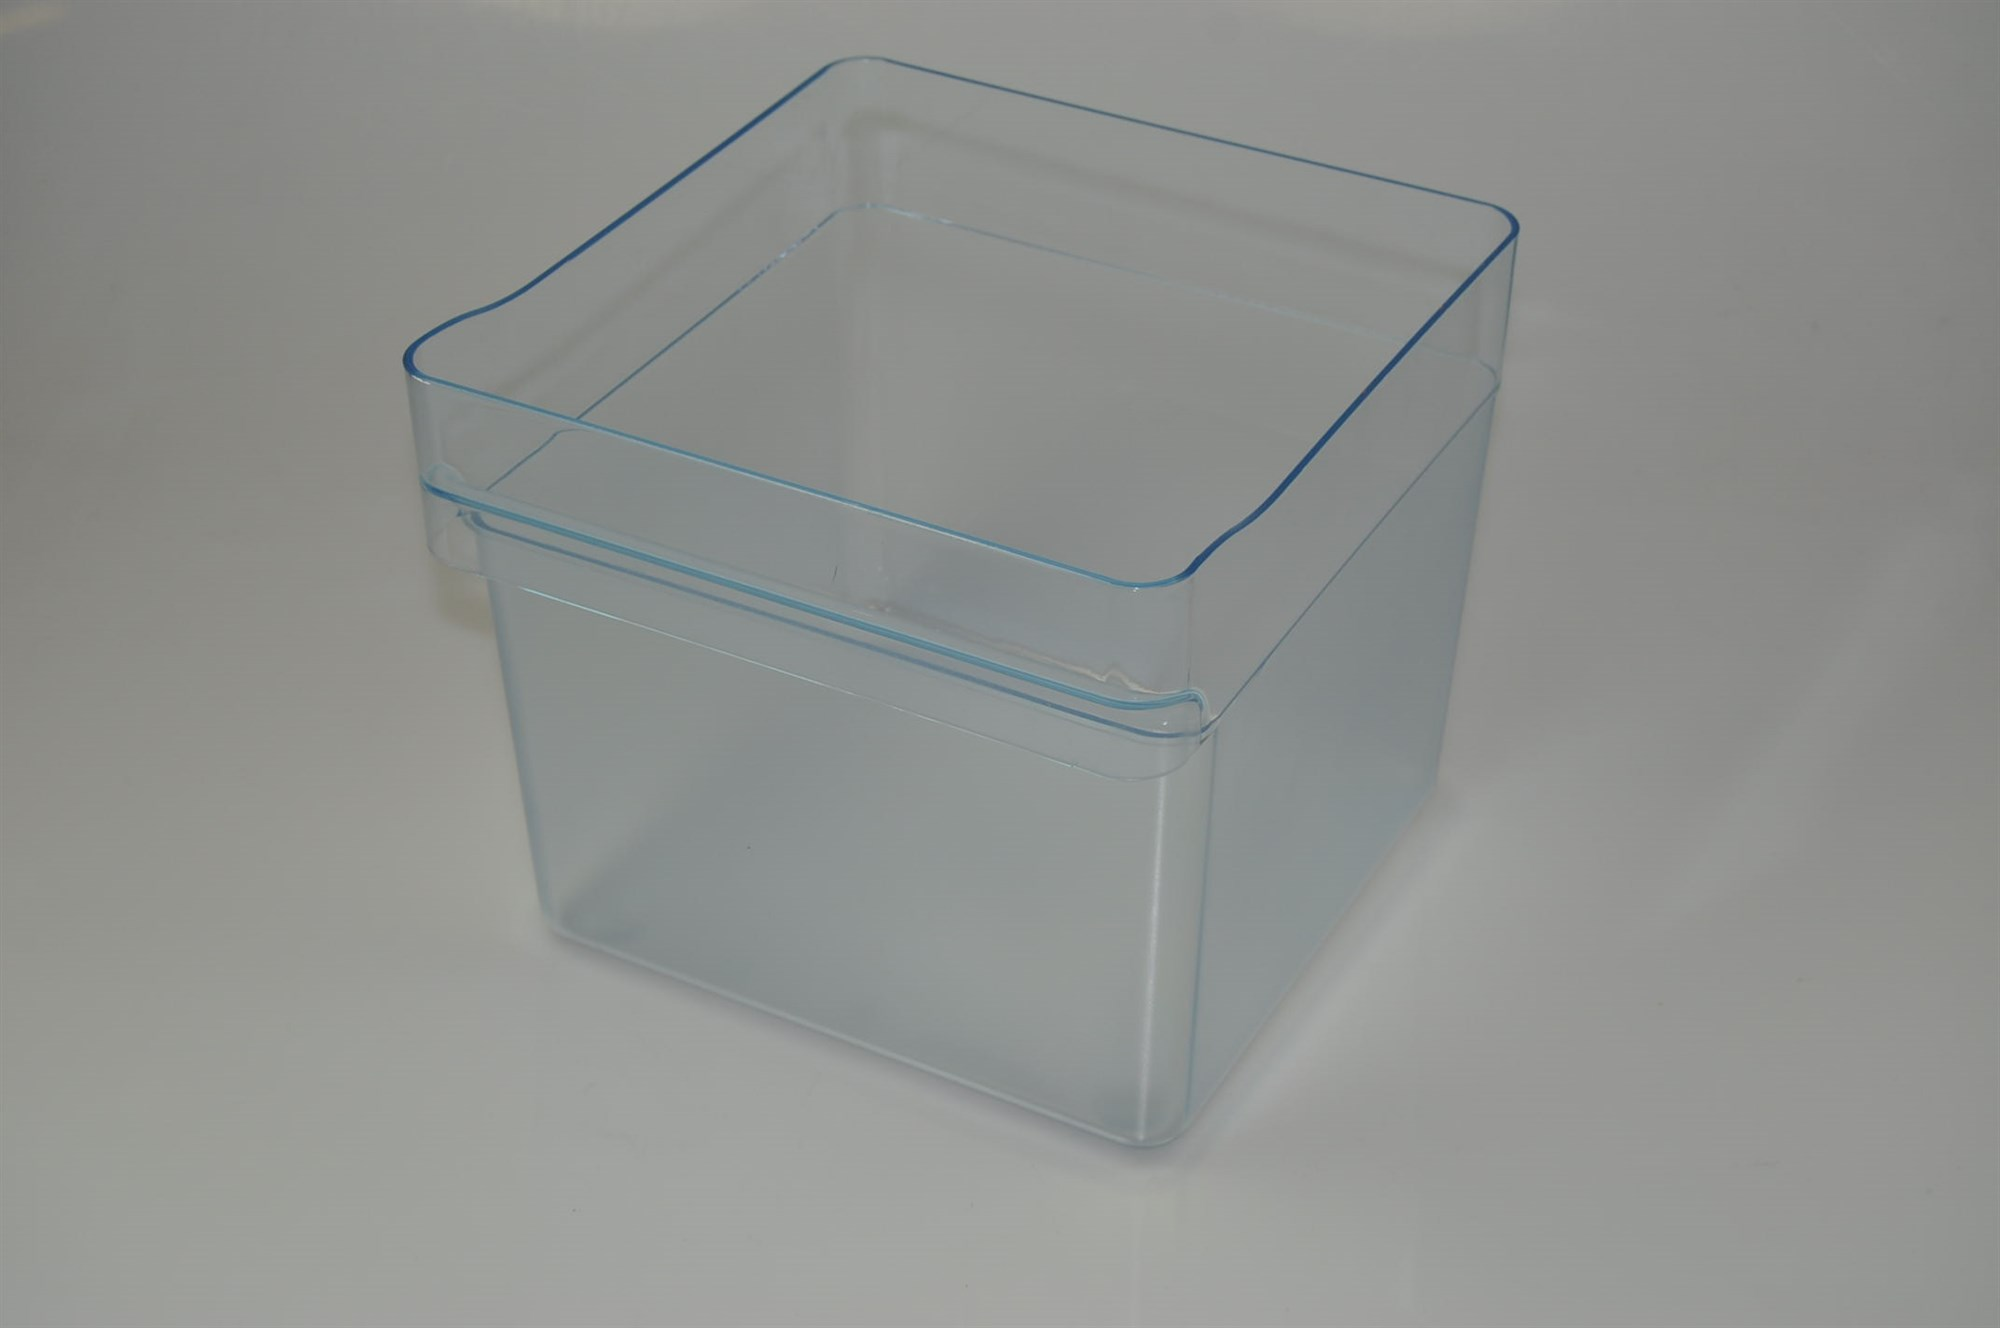 bac l gume gram frigo cong lateur 215 mm x 235 mm x 245 mm. Black Bedroom Furniture Sets. Home Design Ideas